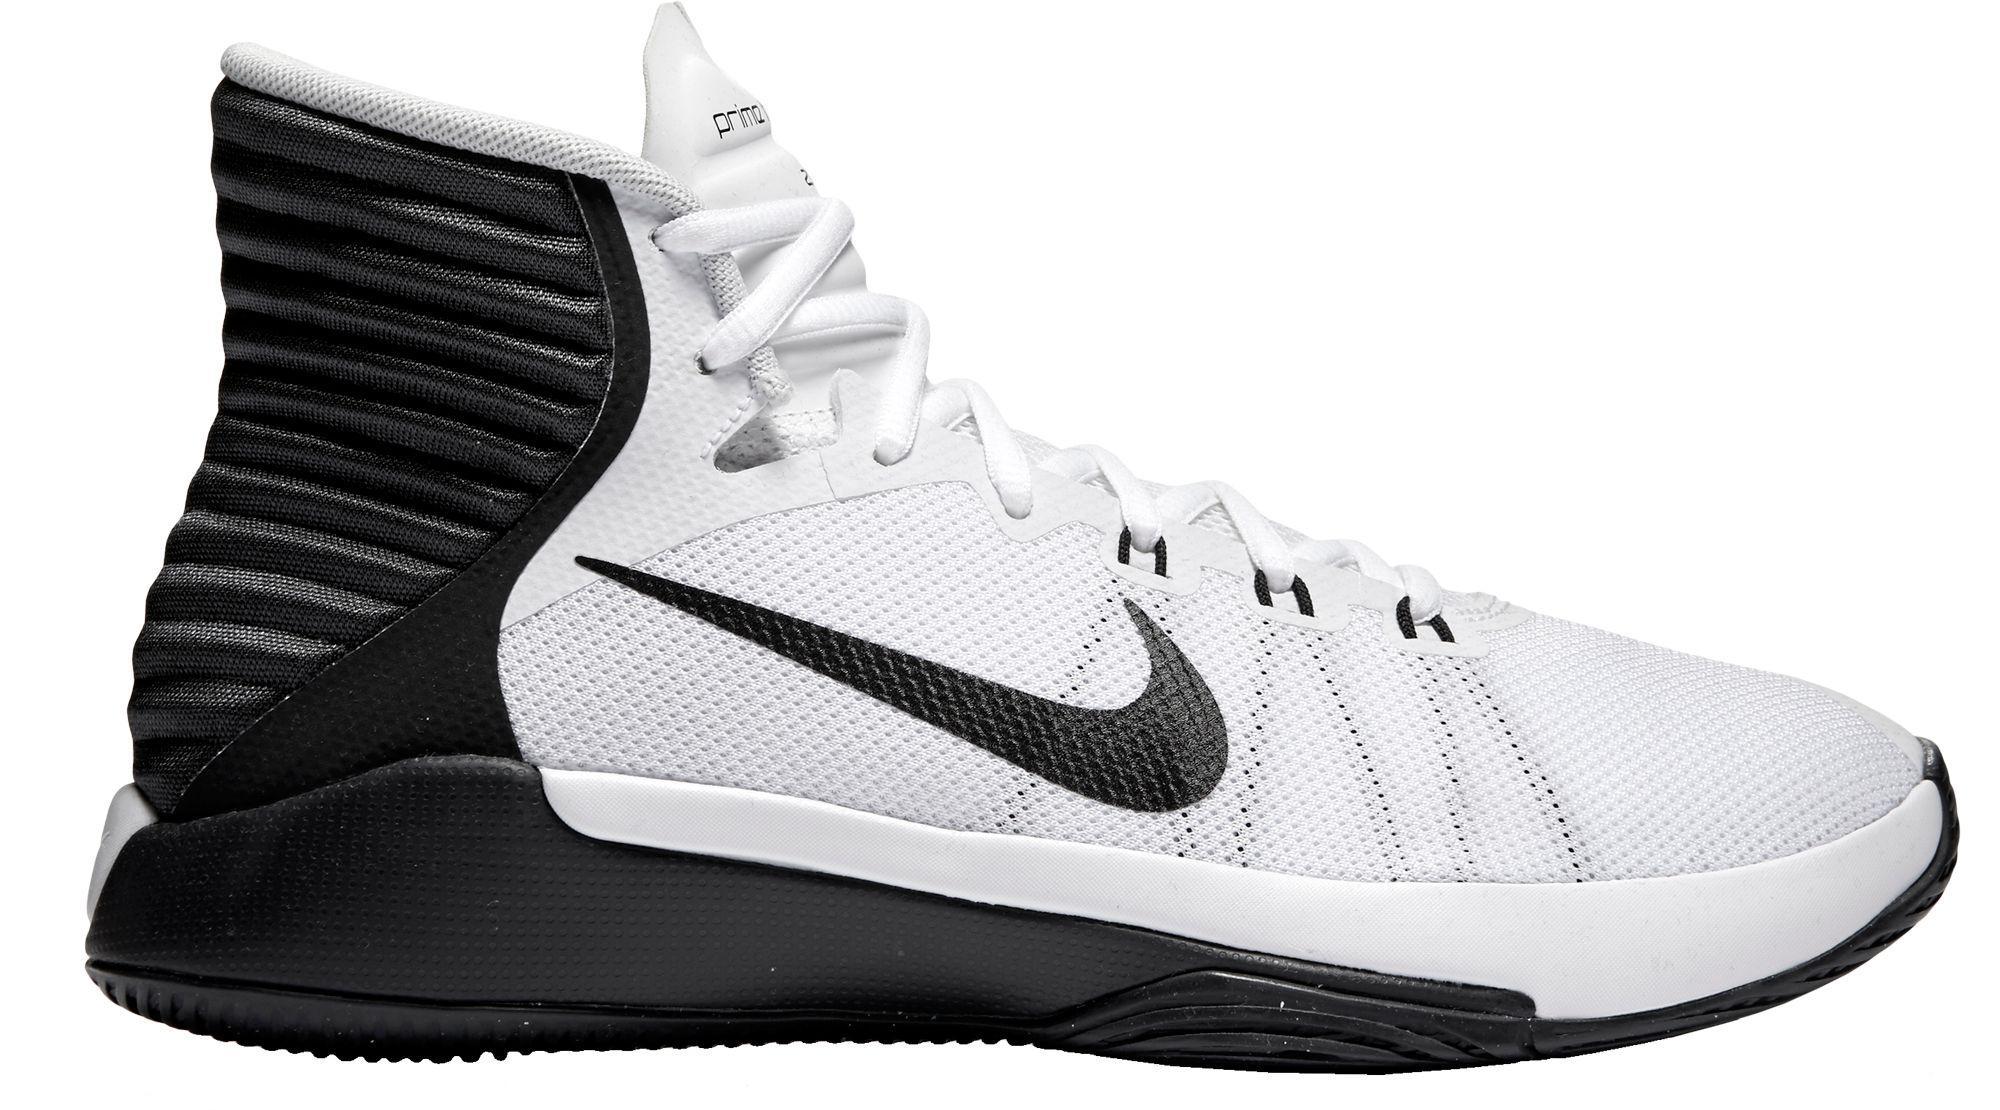 71fe8eb0560b7 nike-WhiteAnthracite-Prime-Hype-Df-2016-Basketball-Shoes.jpeg